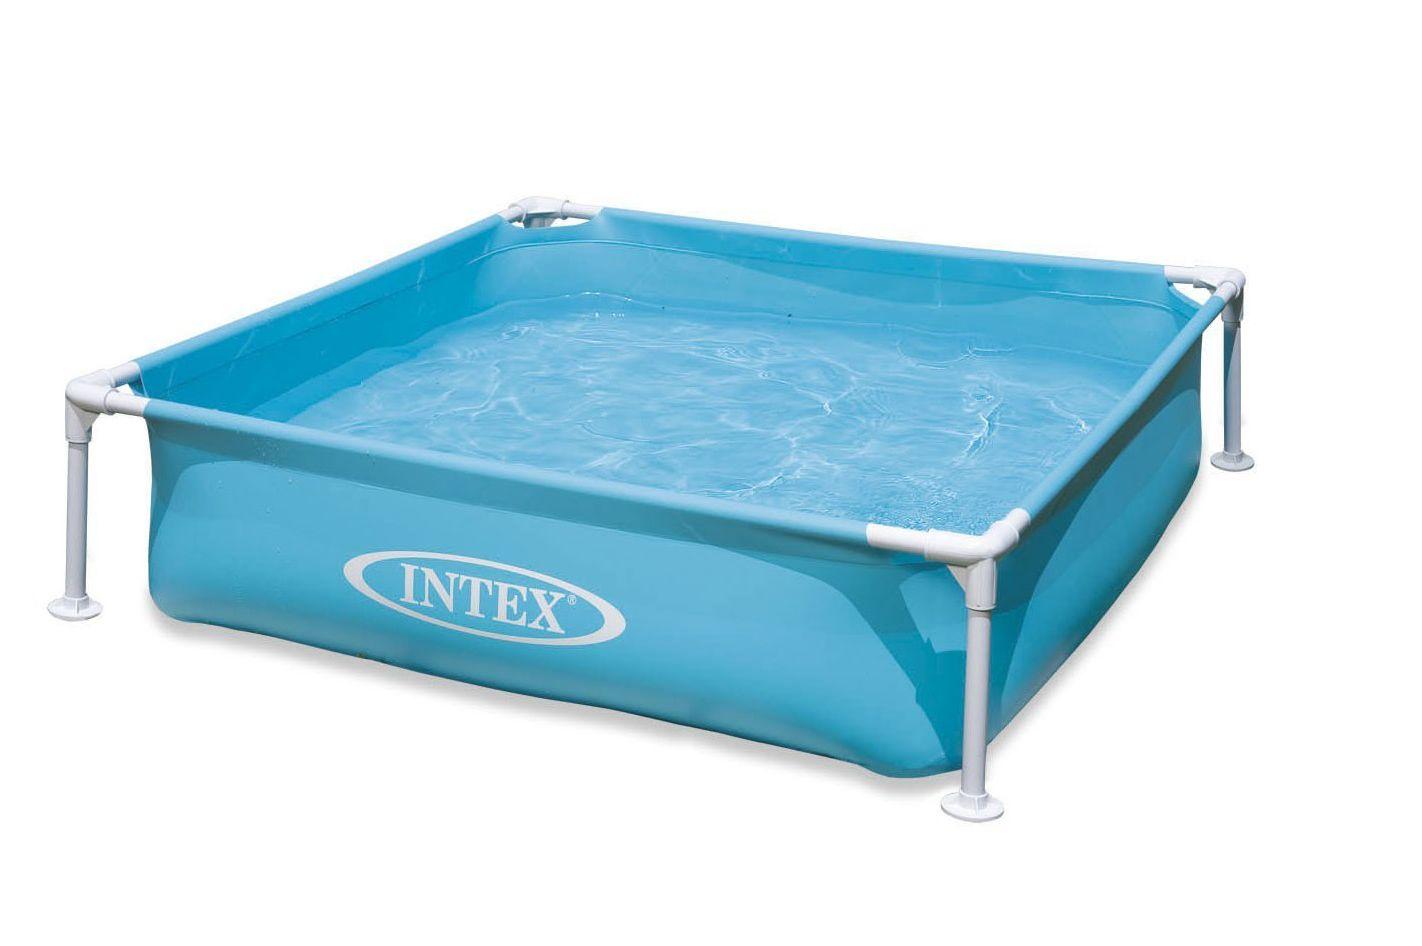 intex pool filter setup instructions